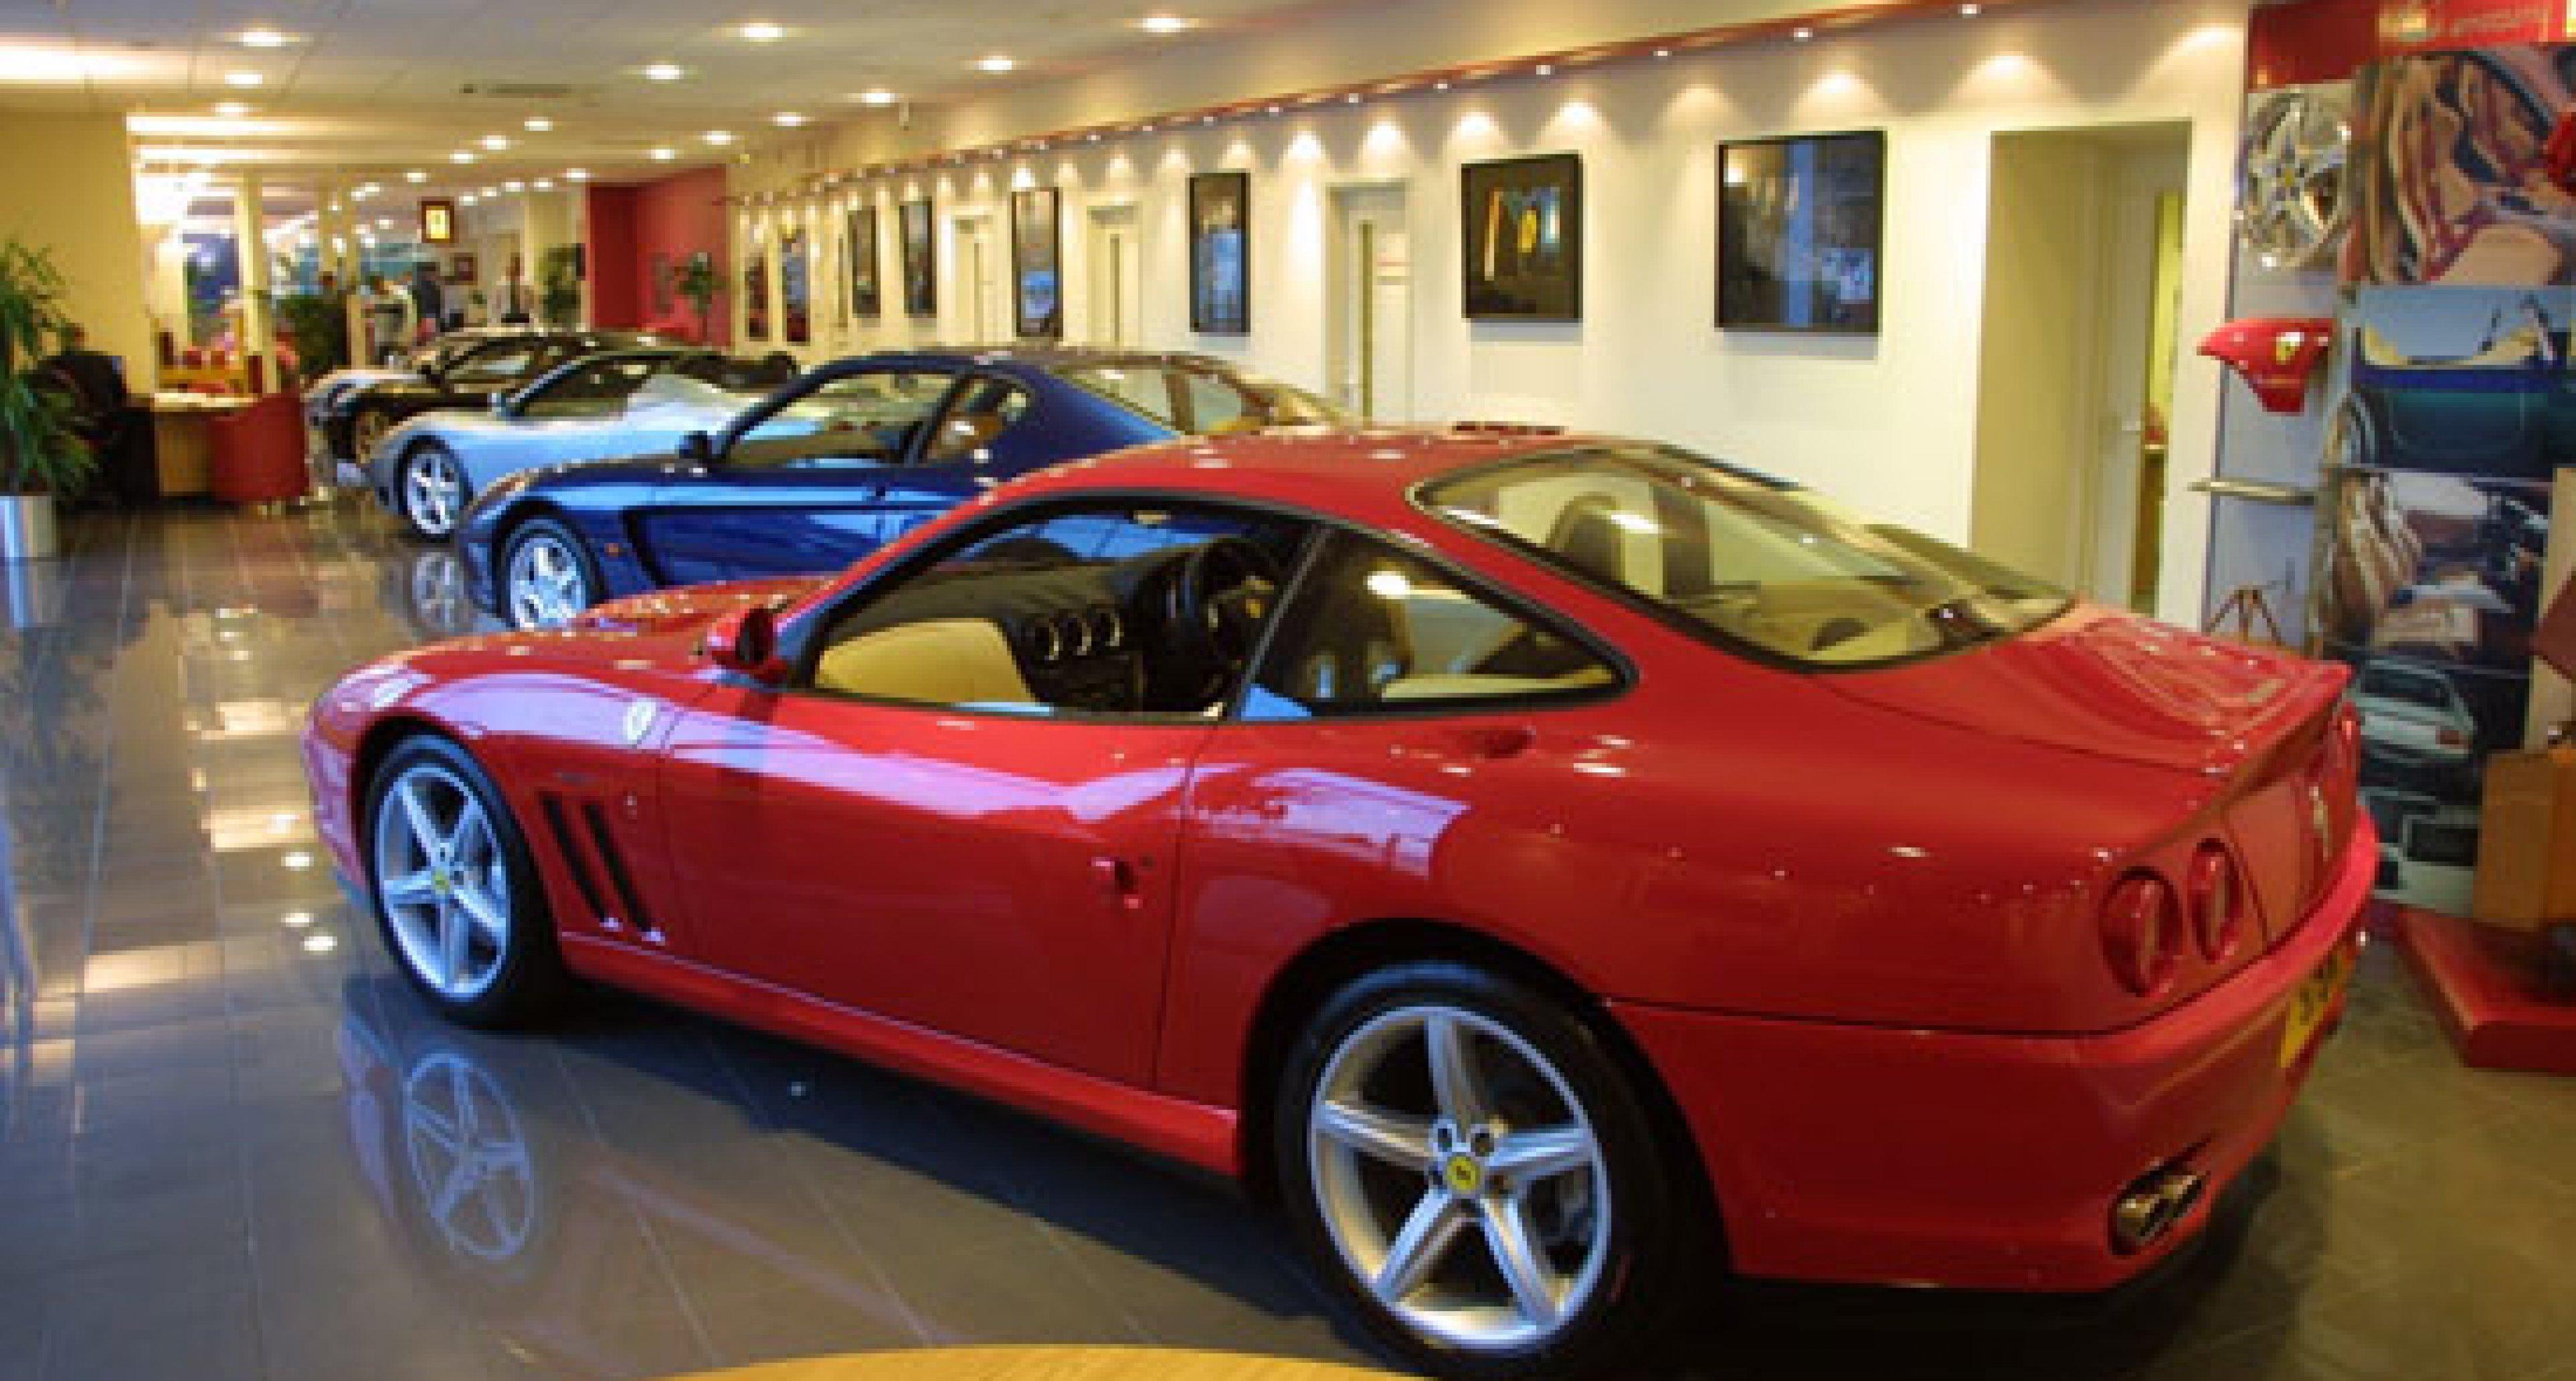 World's largest Ferrari and Maserati showroom opens in UK